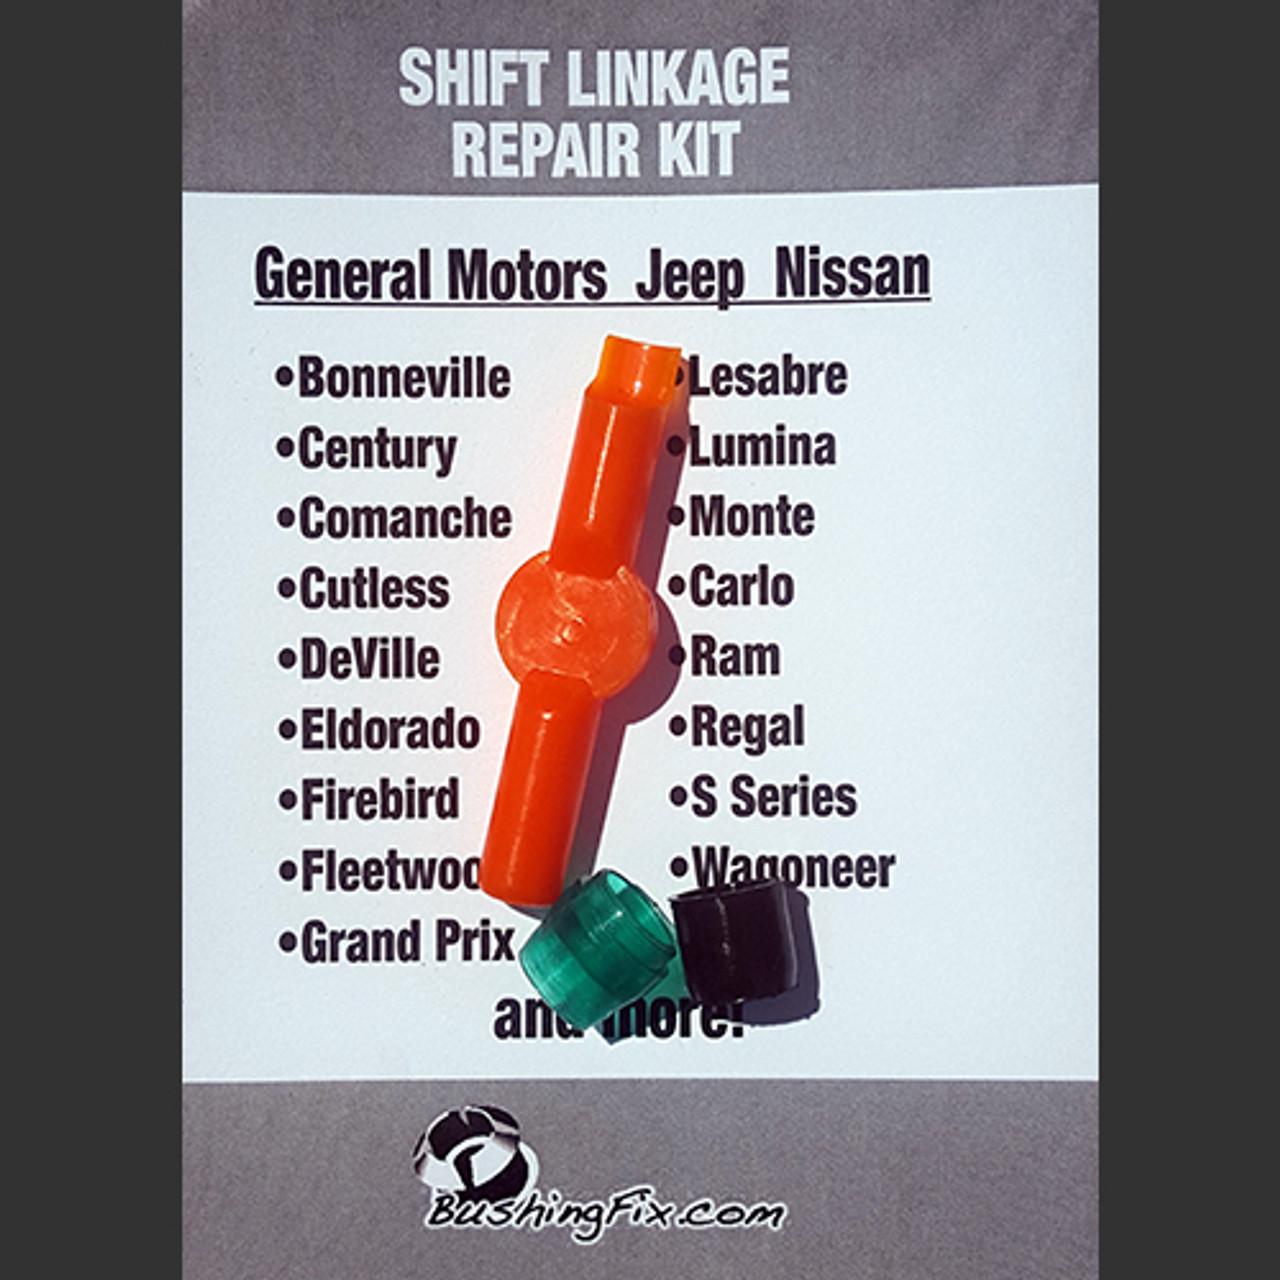 Chevrolet Blazer bushing repair kit